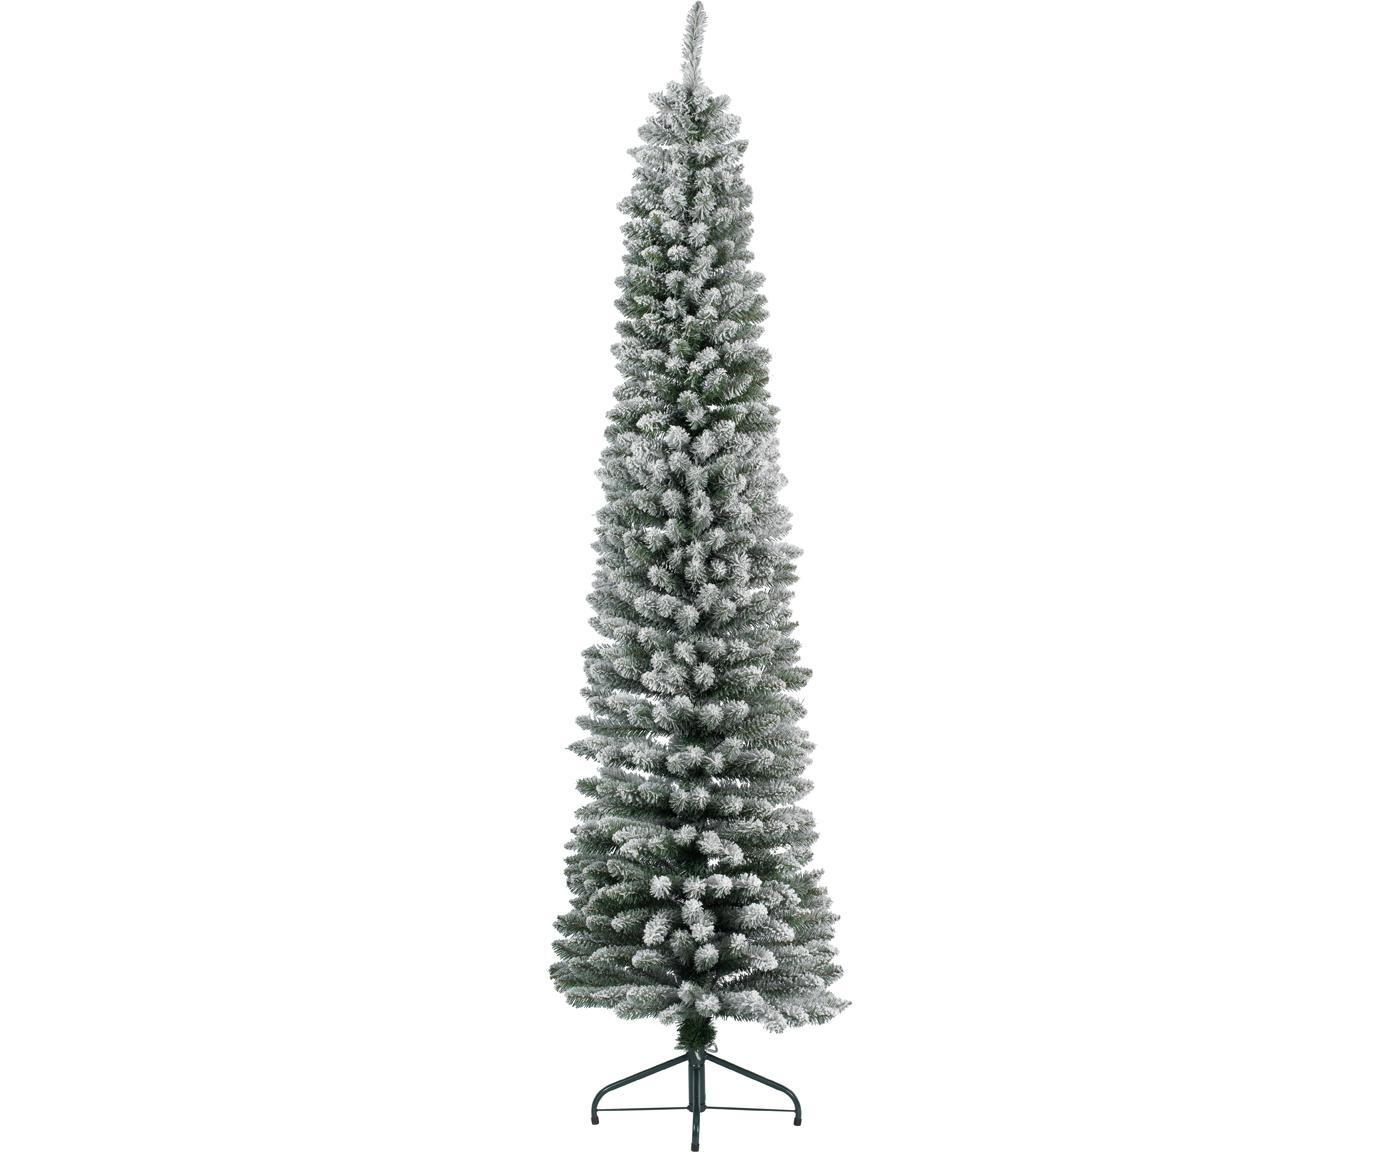 Albero di Natale artificiale Snowy Pencil, Verde, bianco, Ø 45 x Alt. 150 cm